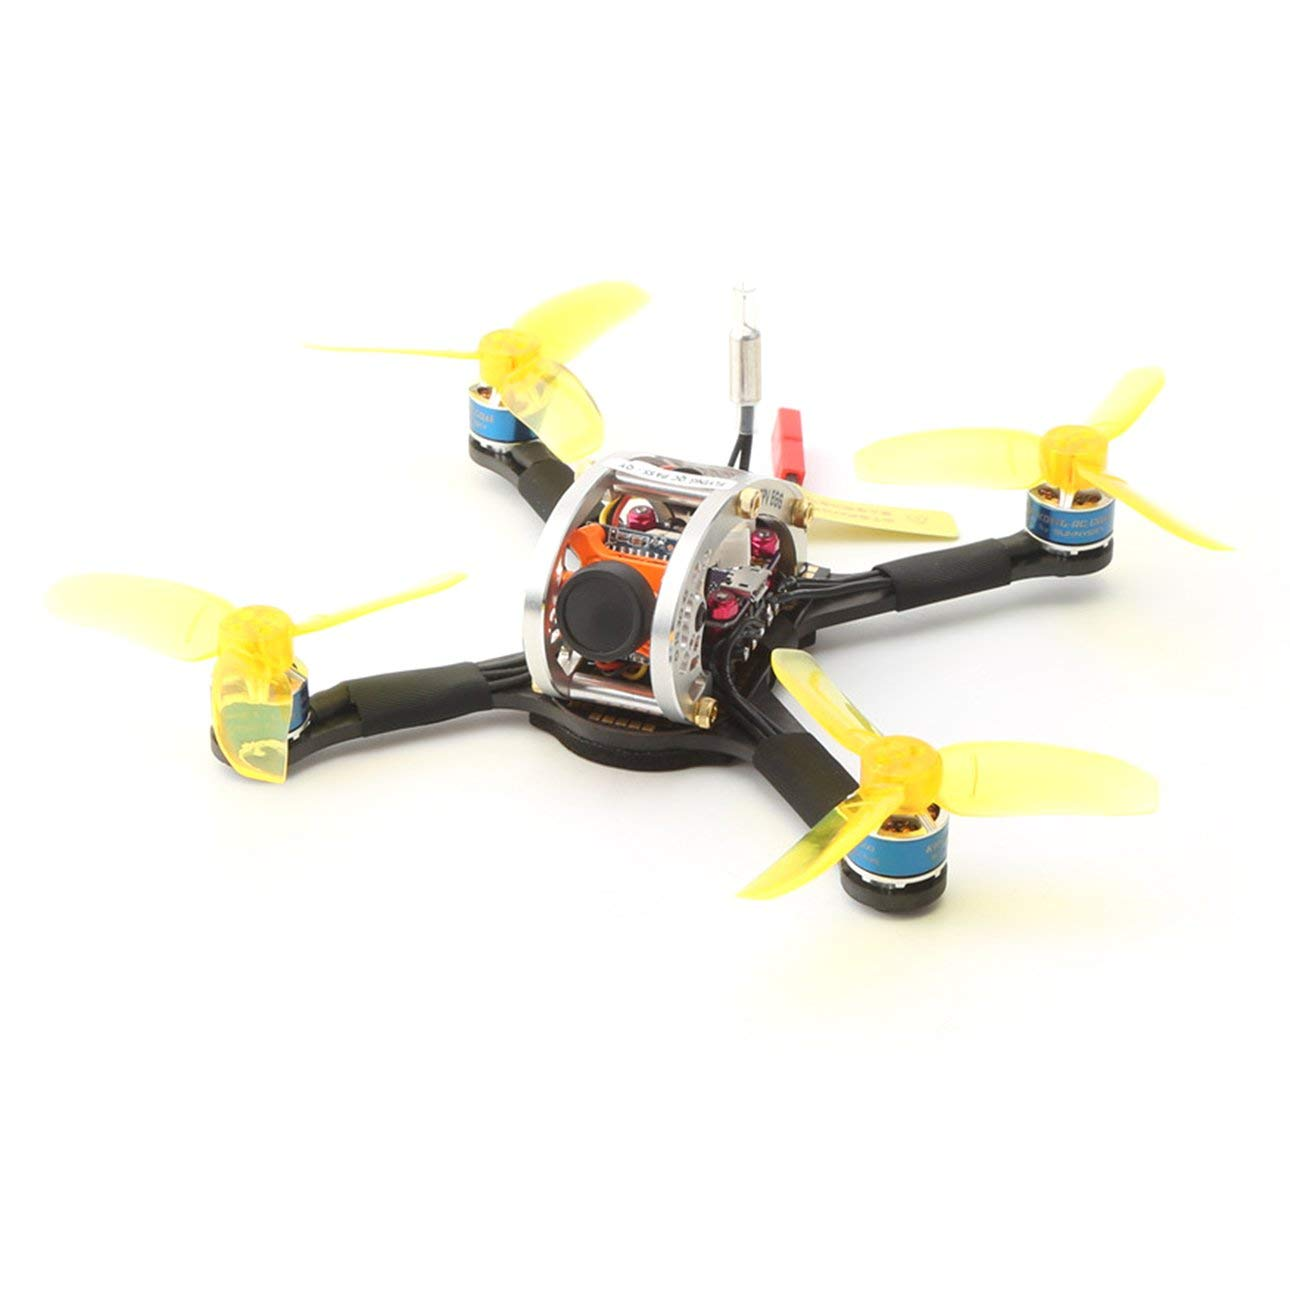 Drohne mit Kamera LDARC FPVEGG V2 5.8G Brushless OSD Kamera Mini FPV RC Racing Drone PNP Version von Ballylyly